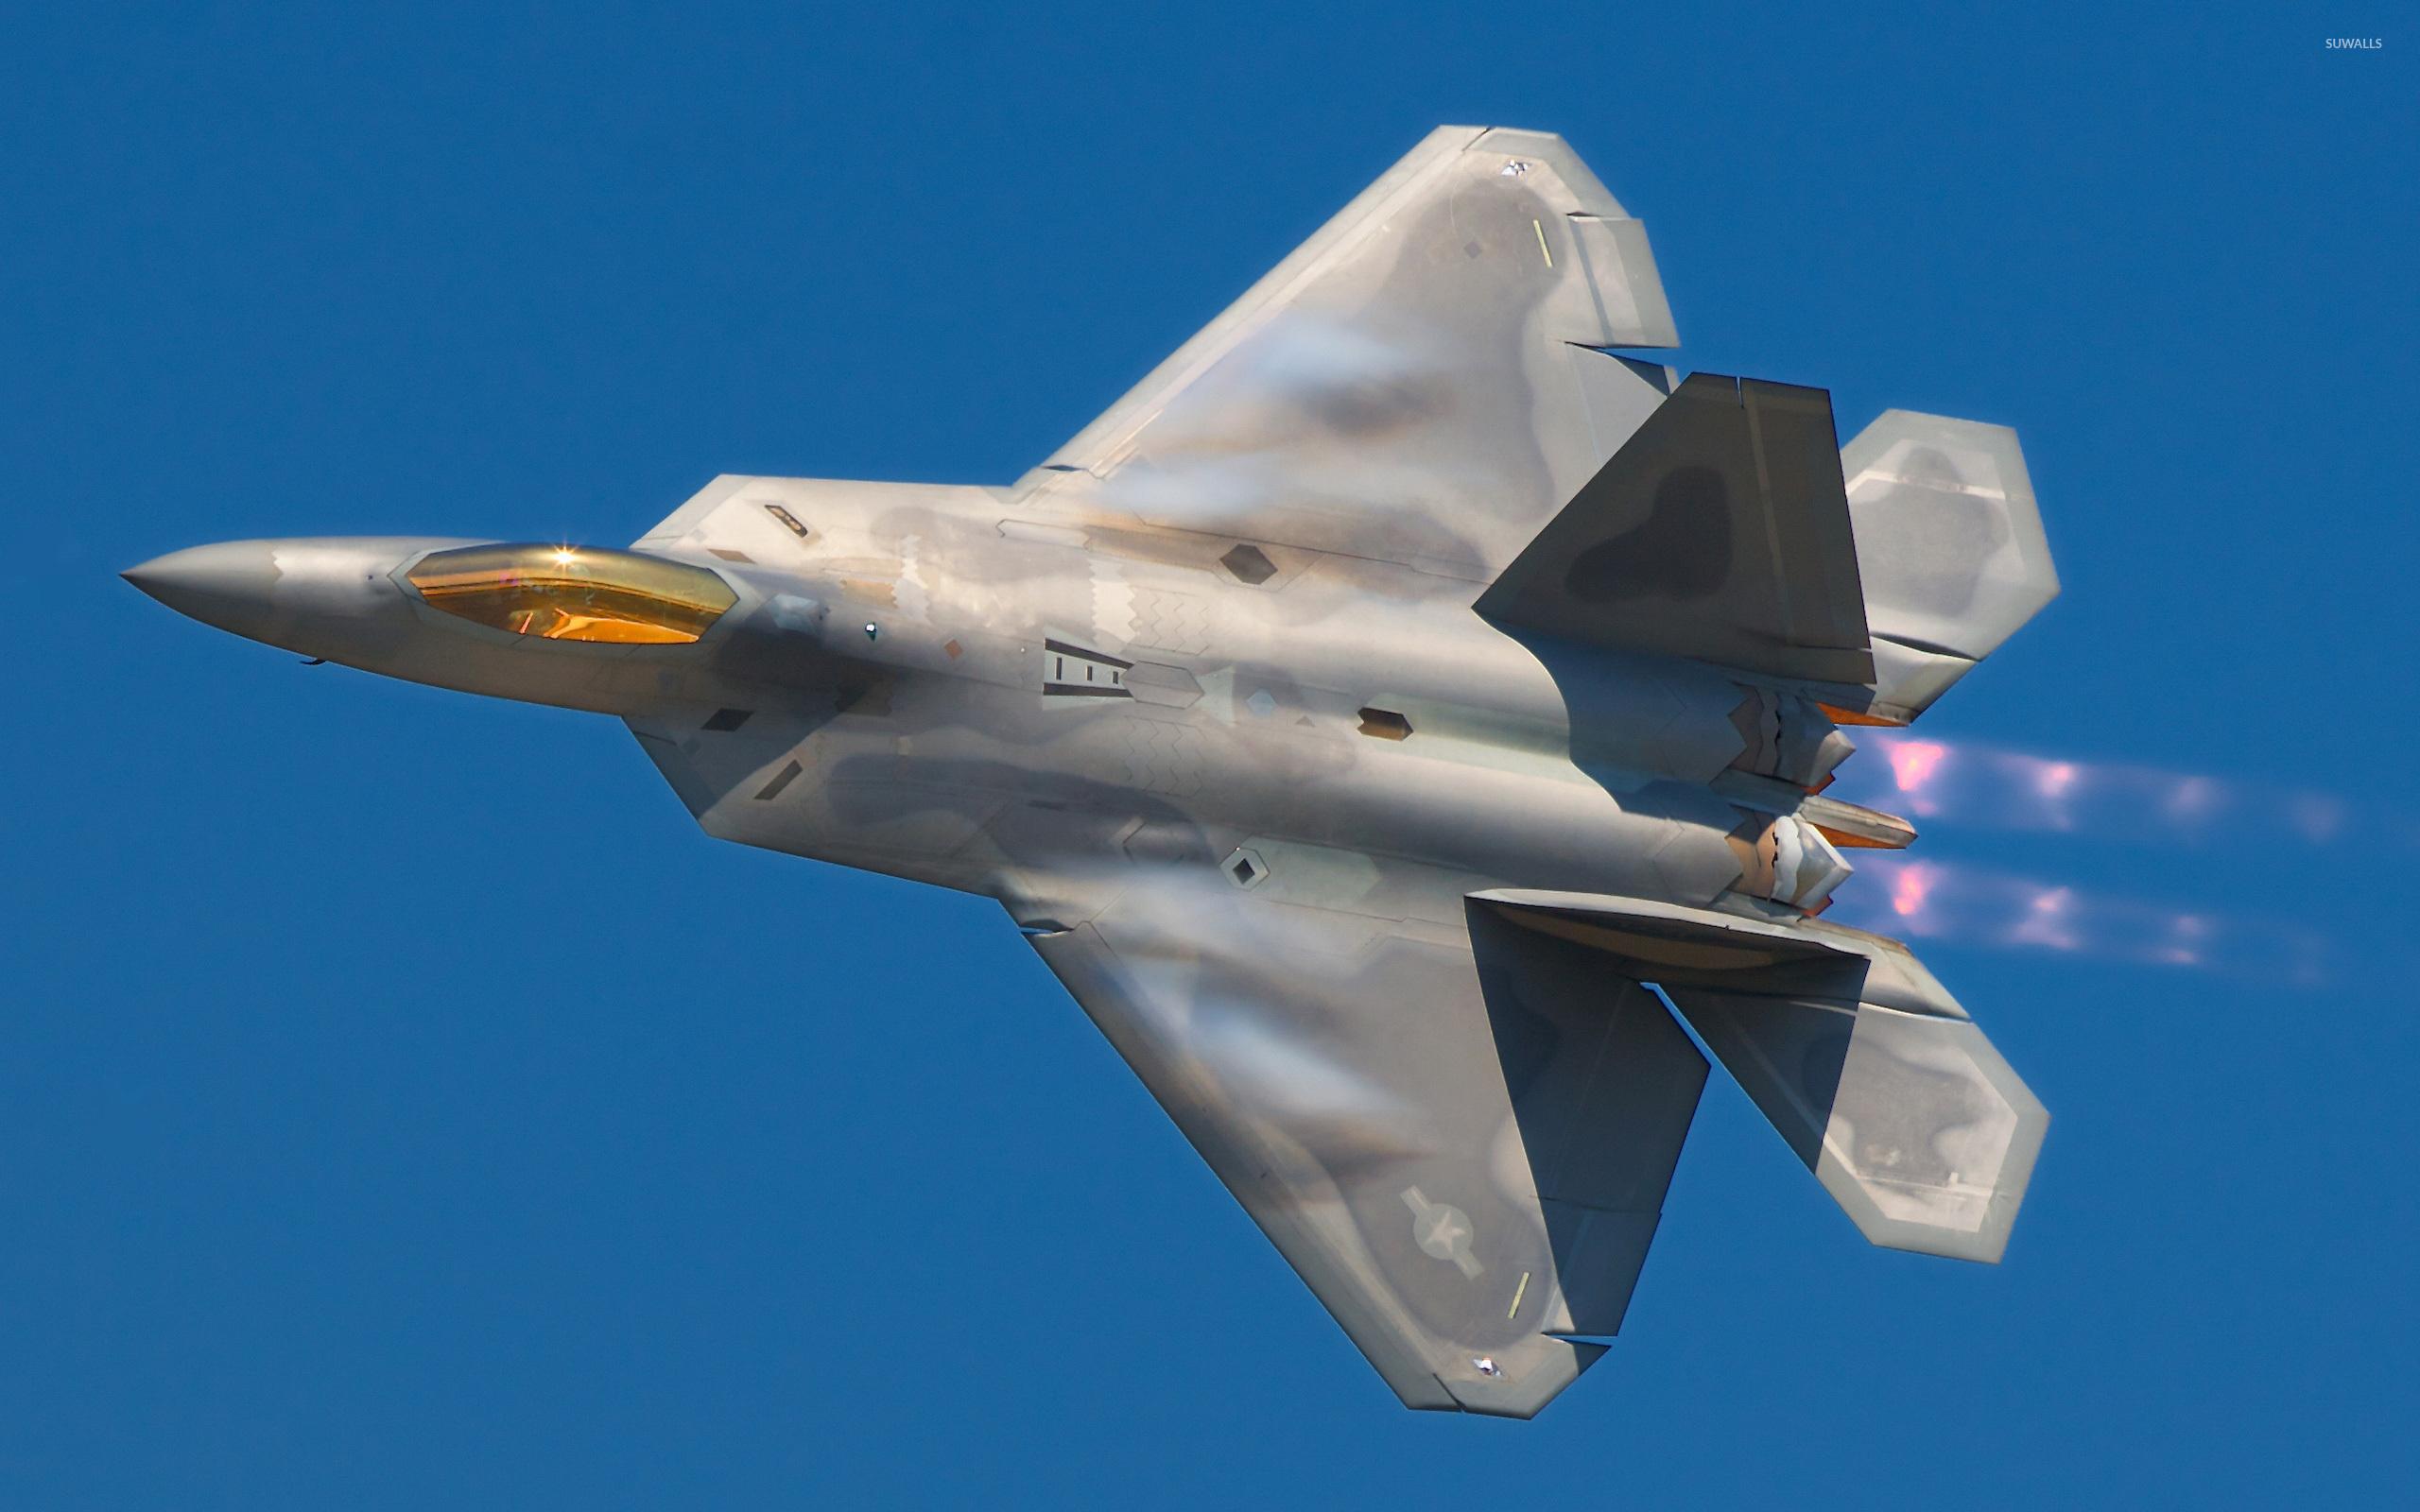 Lockheed Martin F-22 Raptor Desktop Wallpapers HD